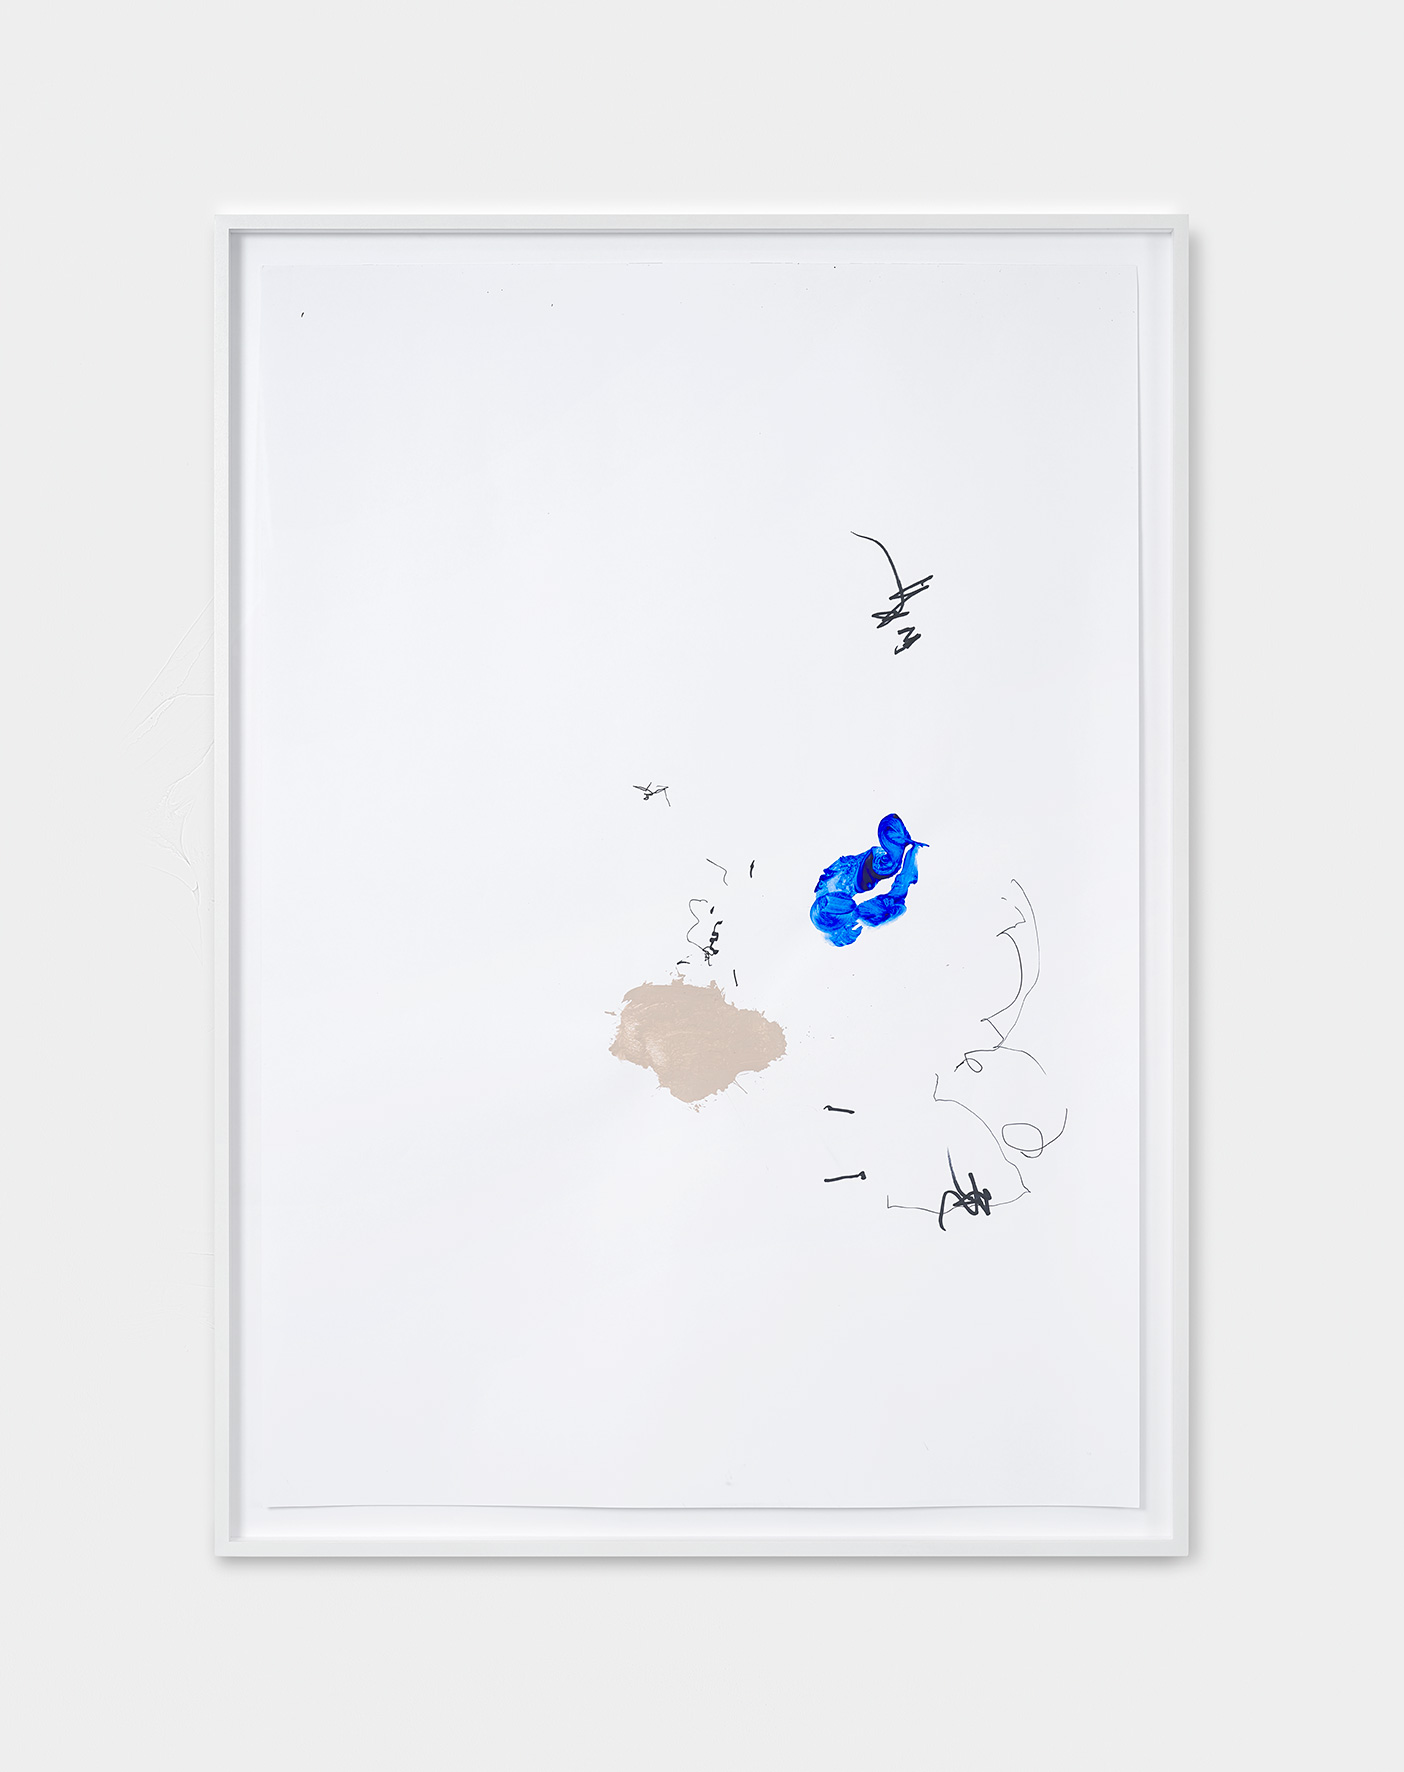 181217 | 2018 | Acryl, Lack, Tusche auf Papier | 95 x 65 cm | ©GALERIE ALBER